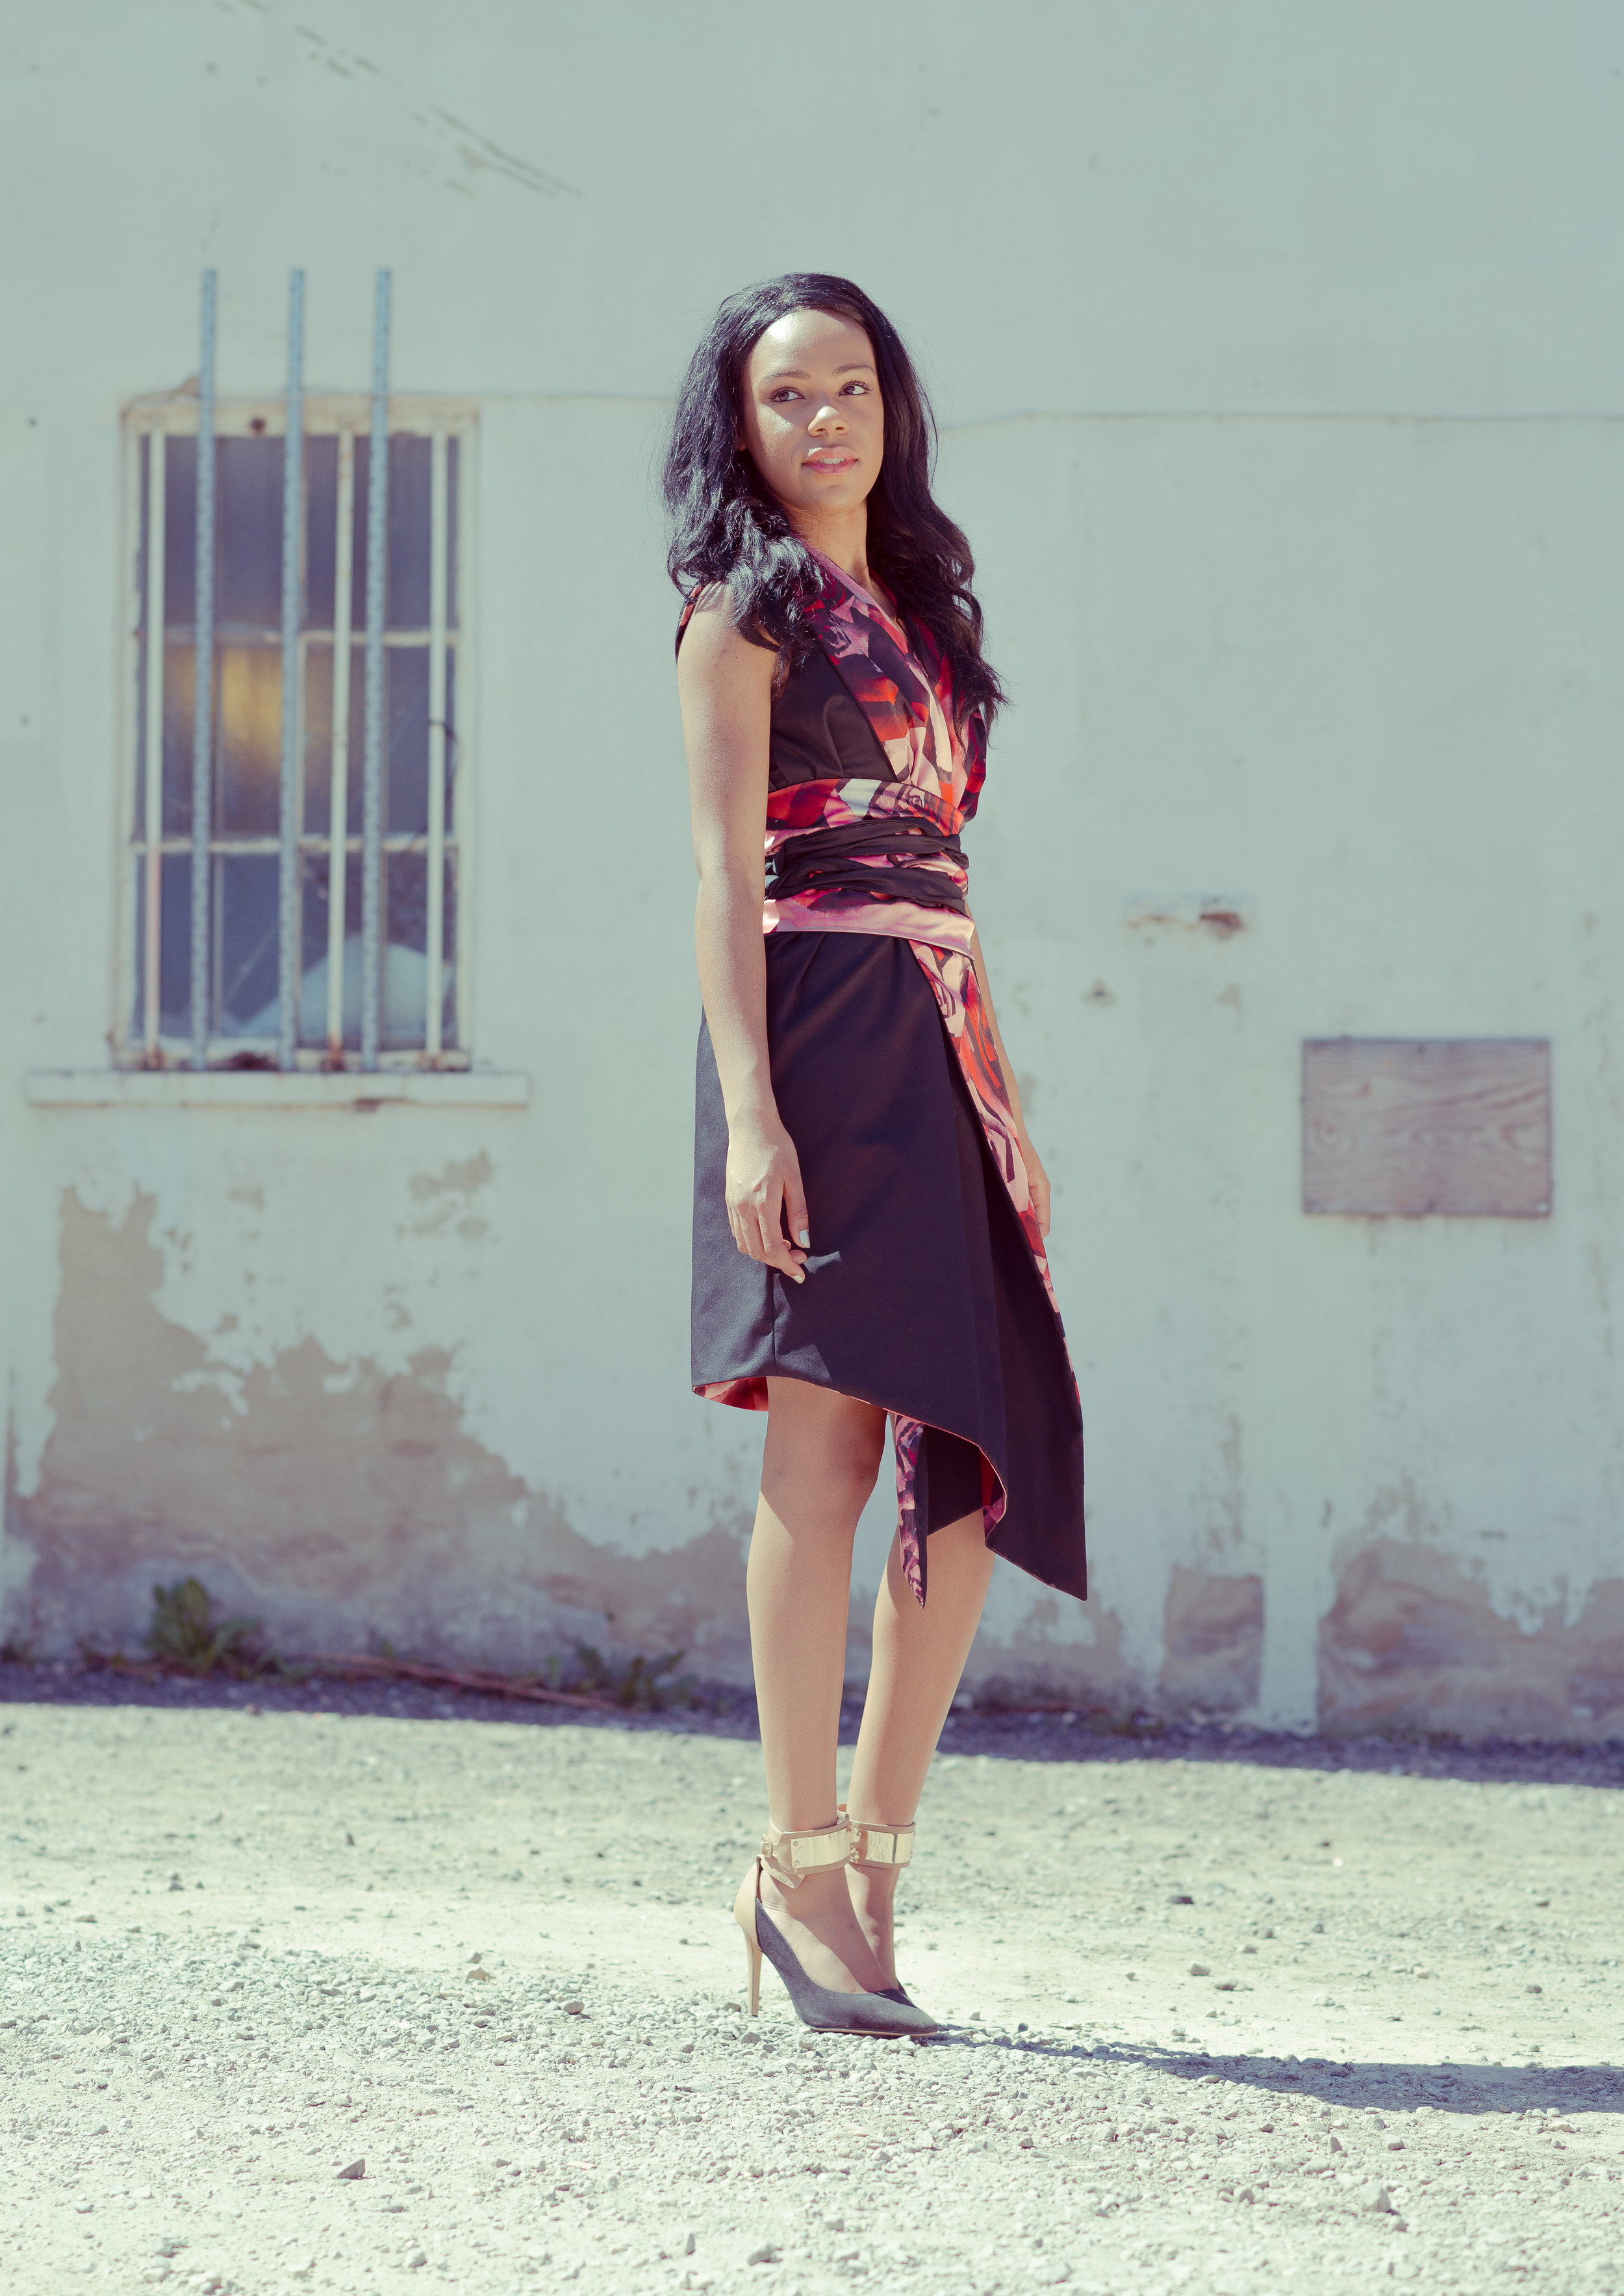 zaramia-ava-zaramiaava-leeds-fashion-designer-ethical-sustainable-tailored-minimalist-emi-red-print-black-jacket-belt-point-skirt-versatile-drape-cowl-styling-womenswear-models-3